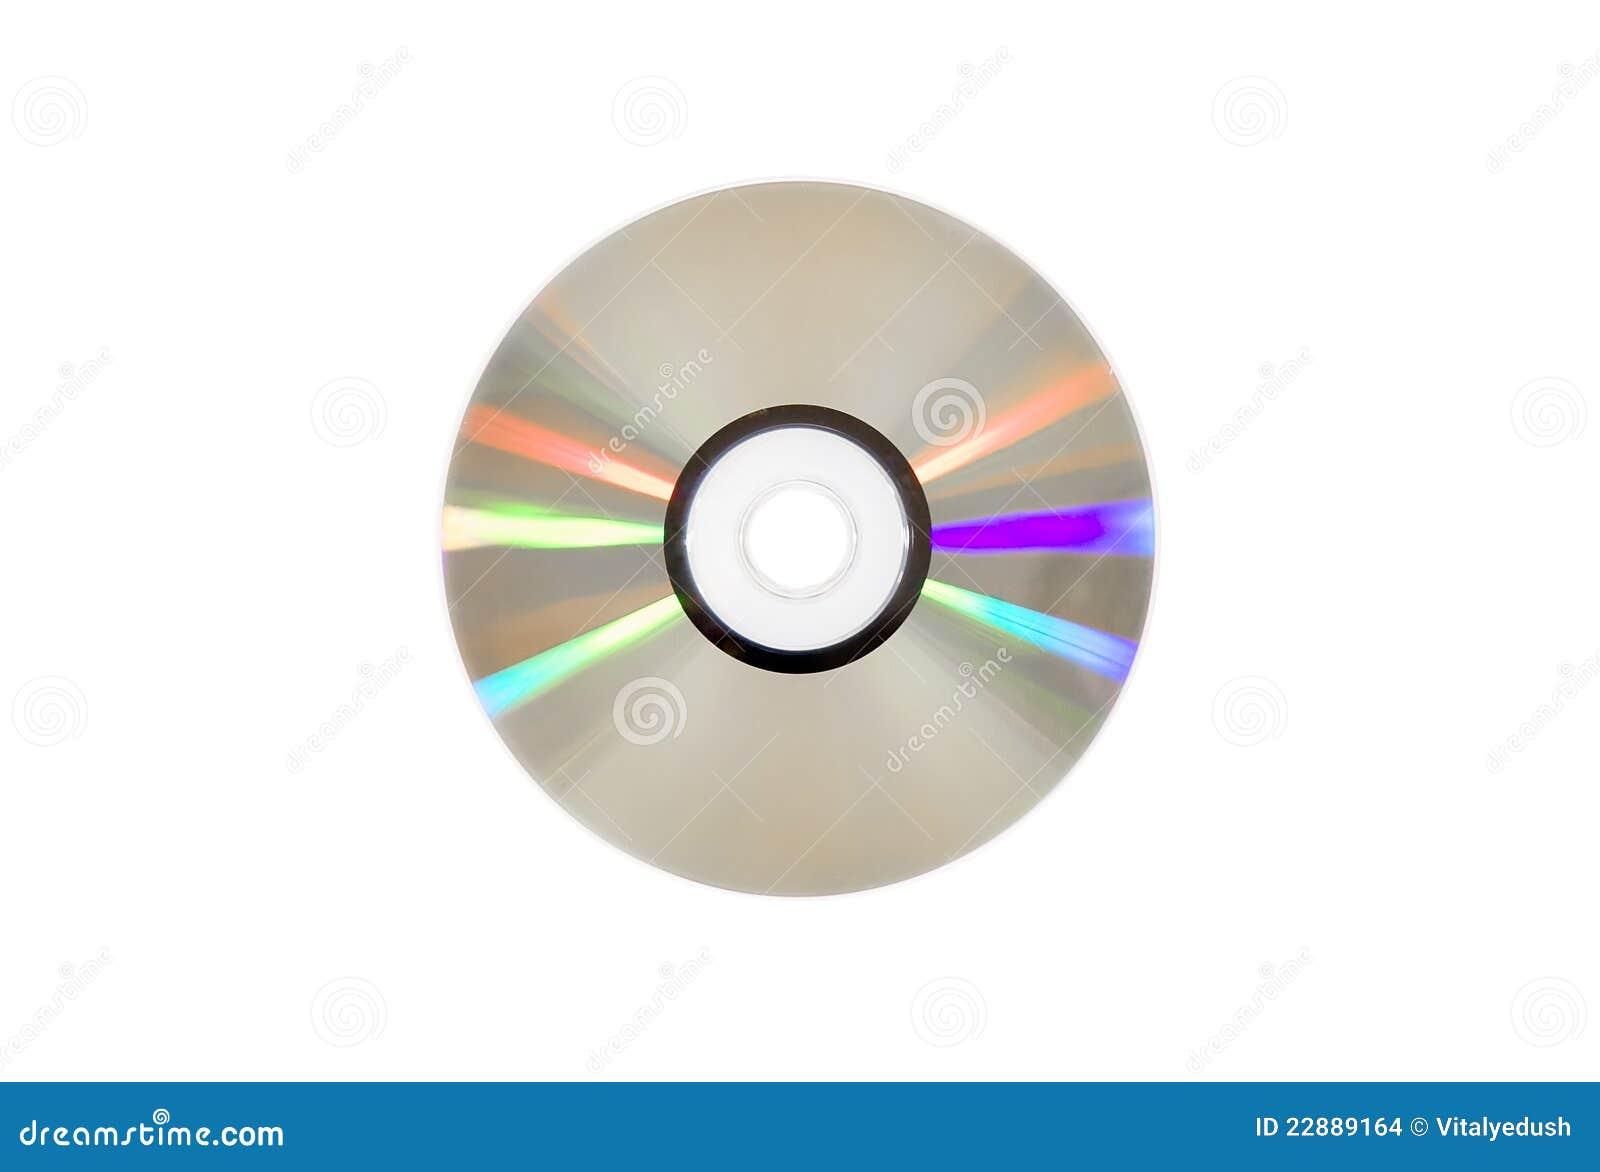 Single DVD(CD) disc.